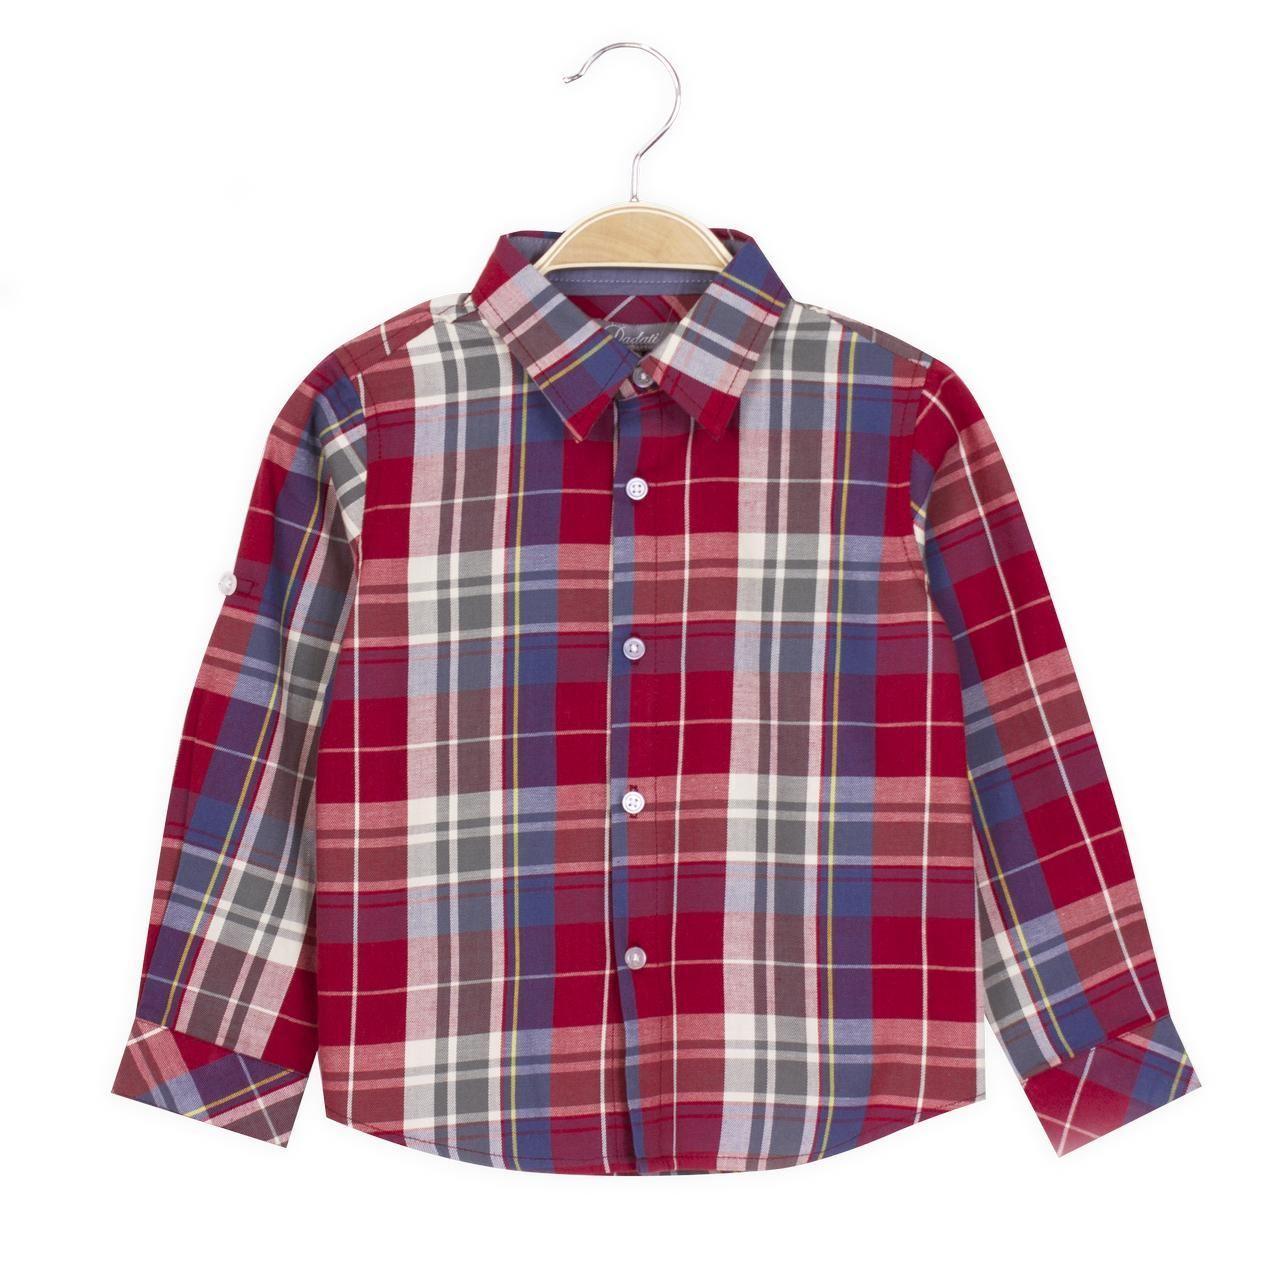 60a003495 Camisa niño Soldadaito de plomo. Dadati - Moda infantil